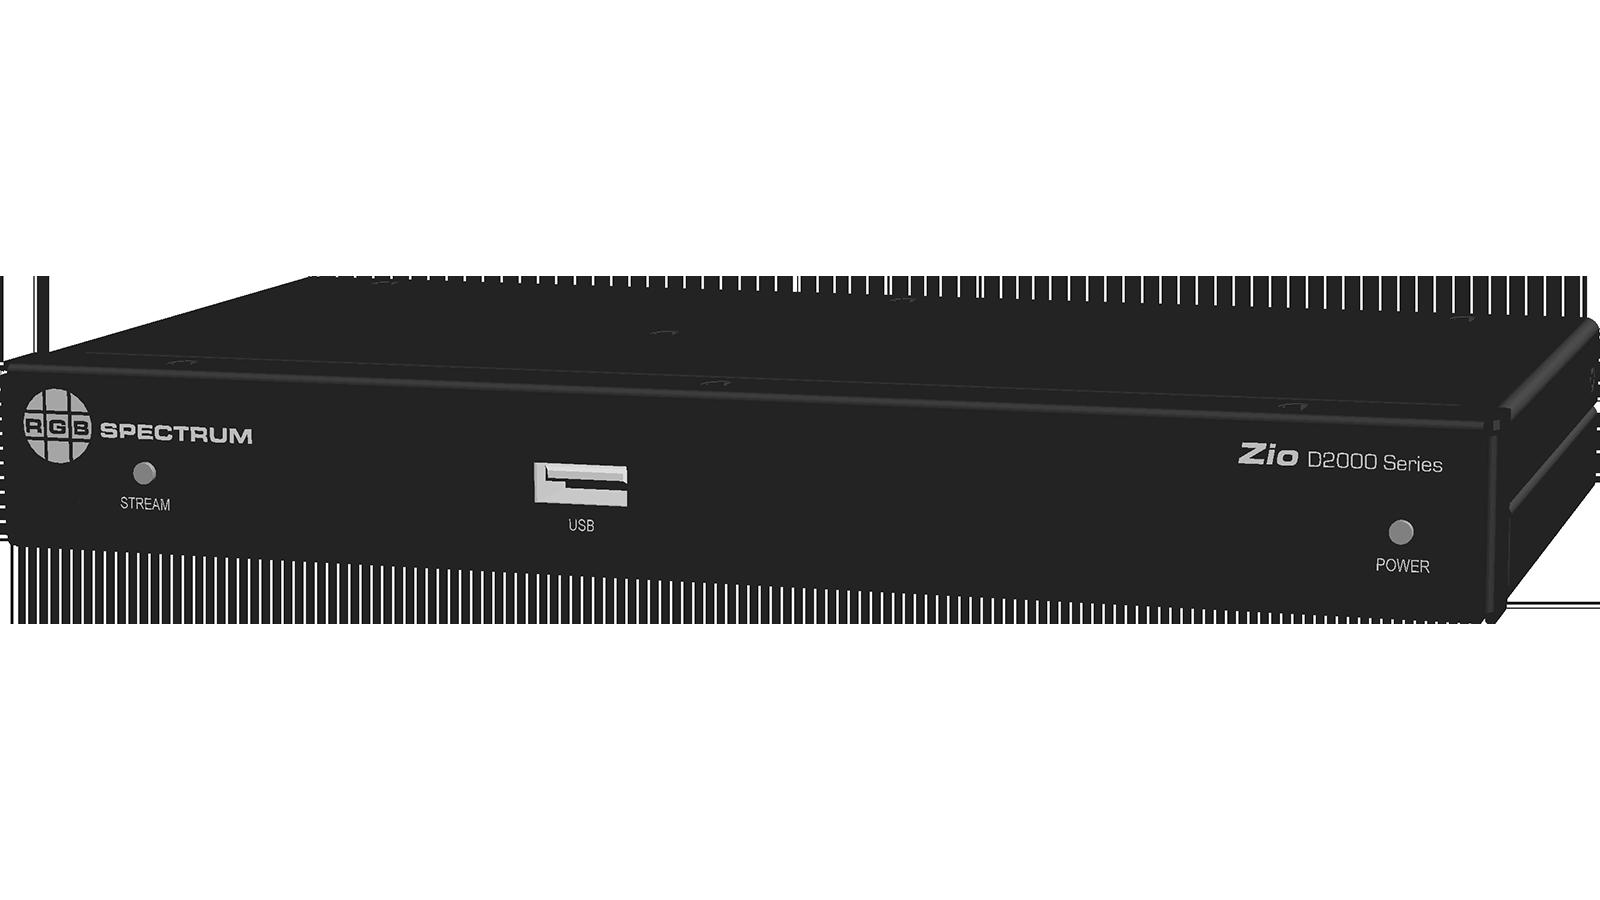 D2000 Series Decoder: Front Panel